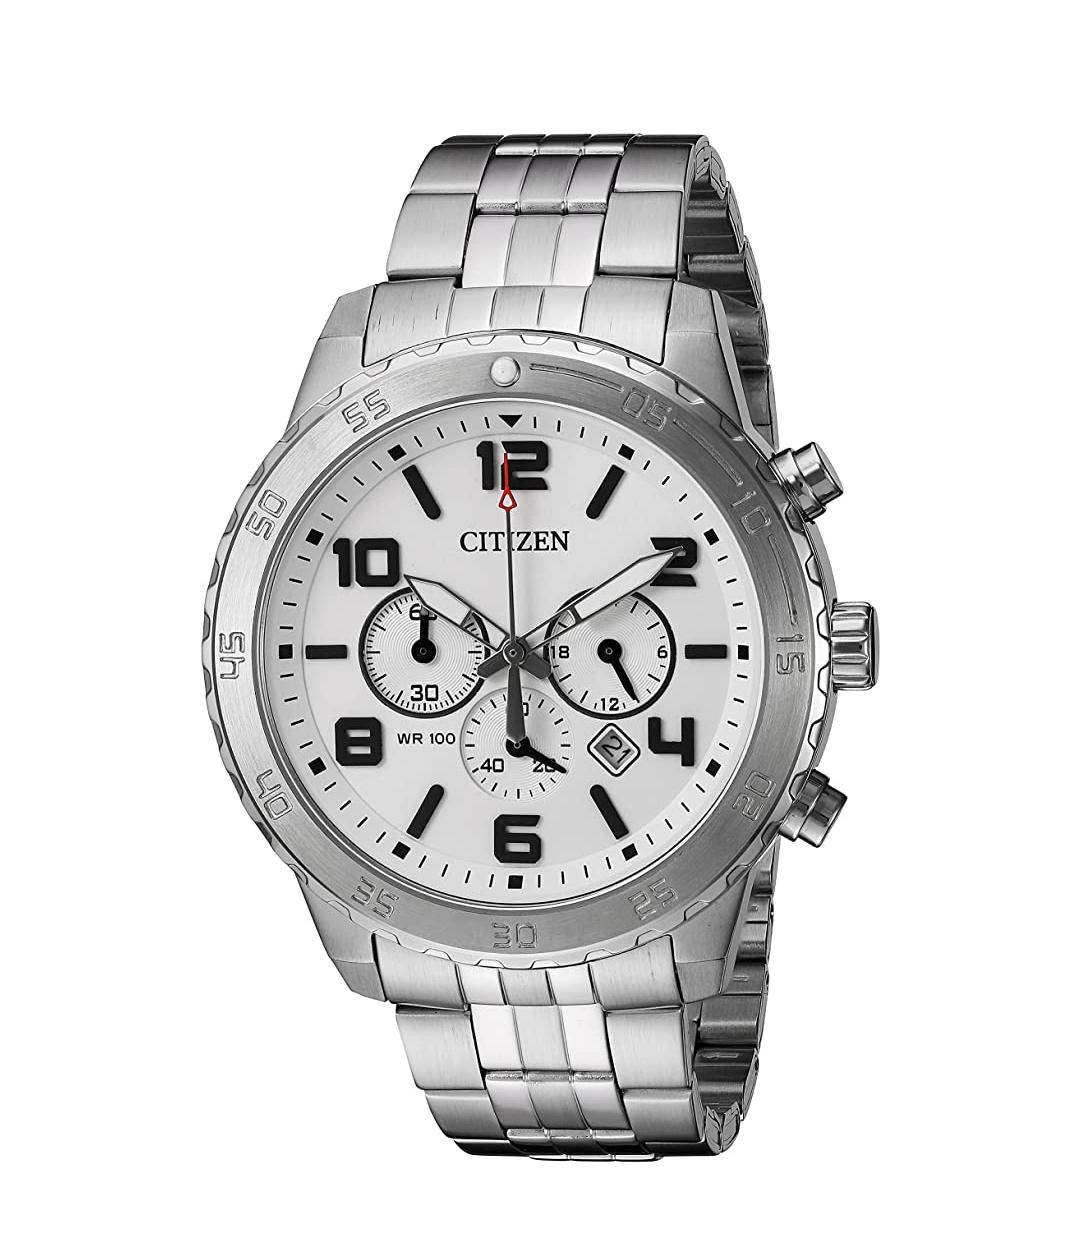 CITIZEN Analoog kwarts horloge met roestvrij stalen armband AN8130-53A [Amazon.nl]